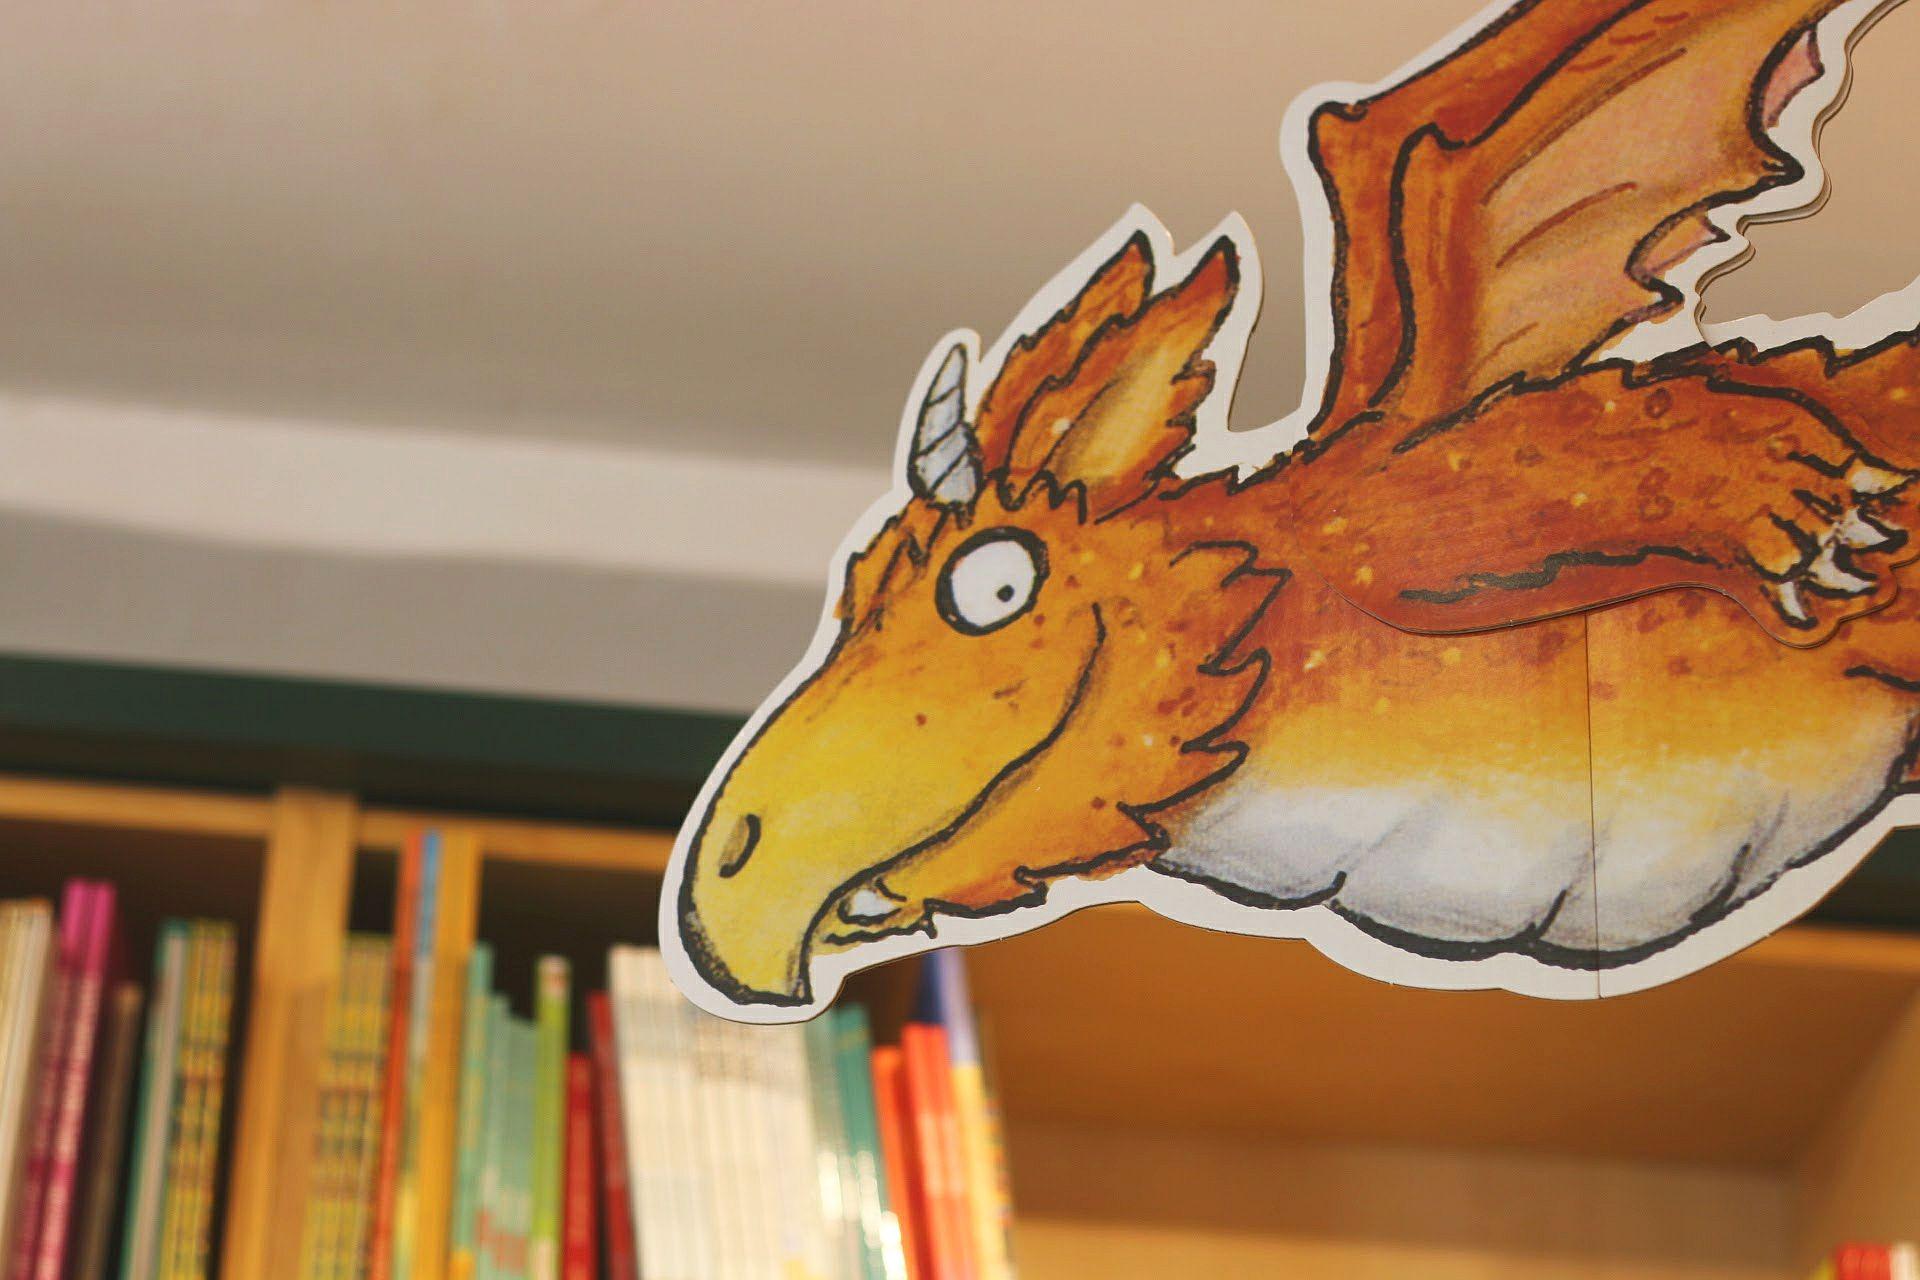 Drache Pappfigur Figur Kinderbuchhandlung Blogger-Event